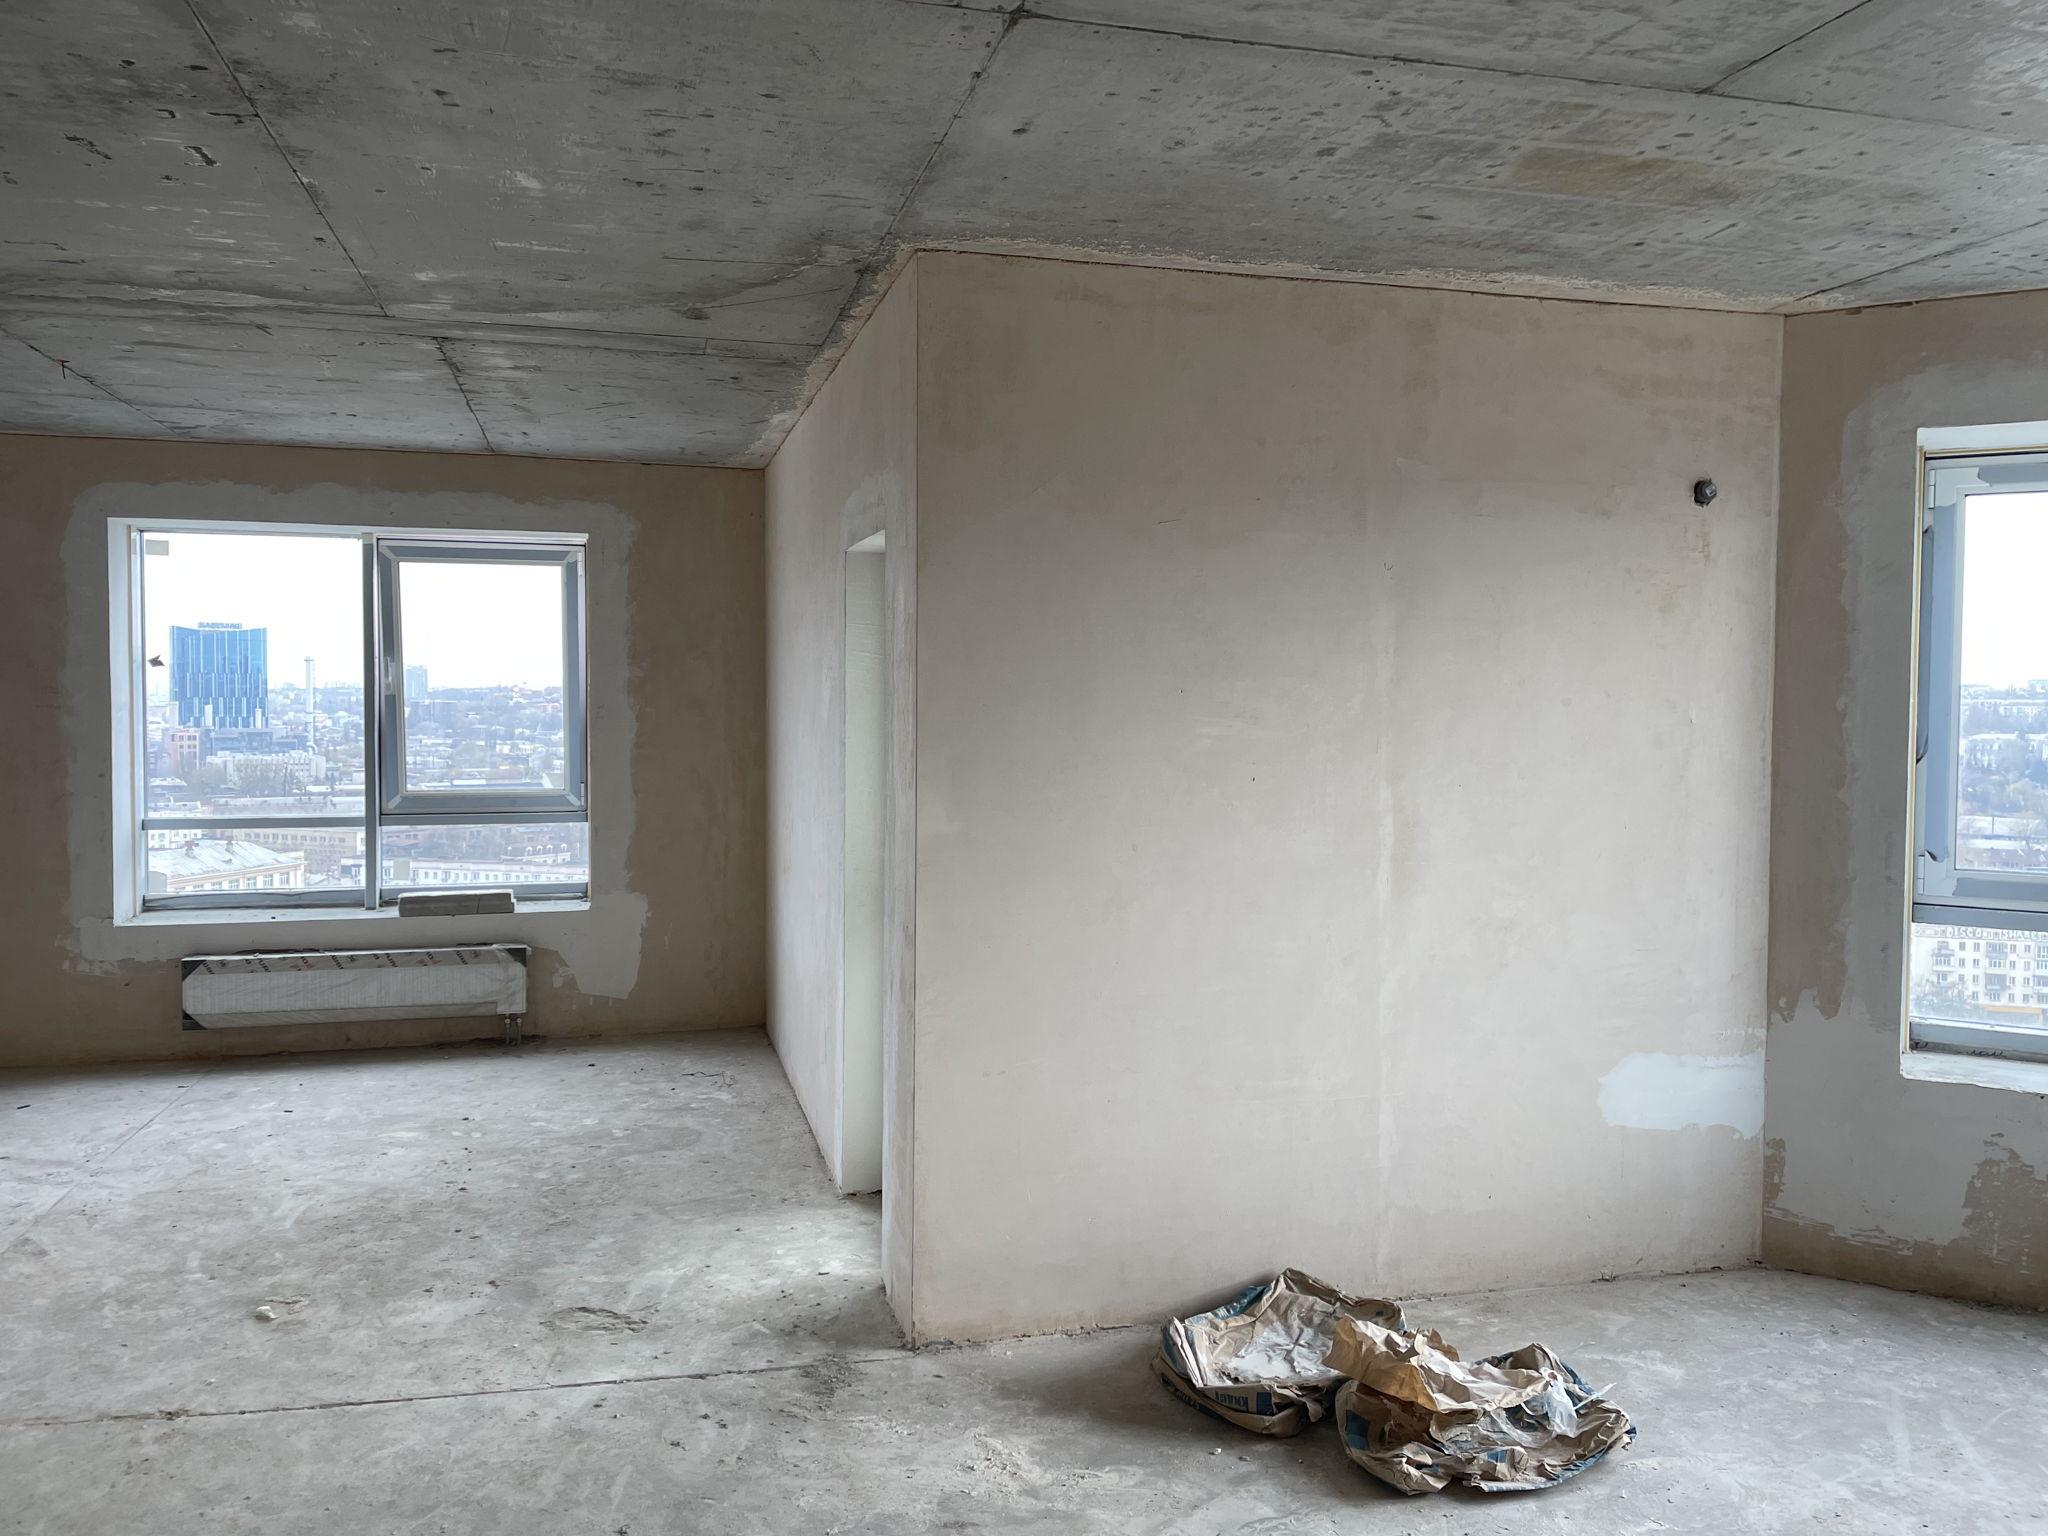 Квартира W-6388218, Златоустовская, 27, Киев - Фото 10